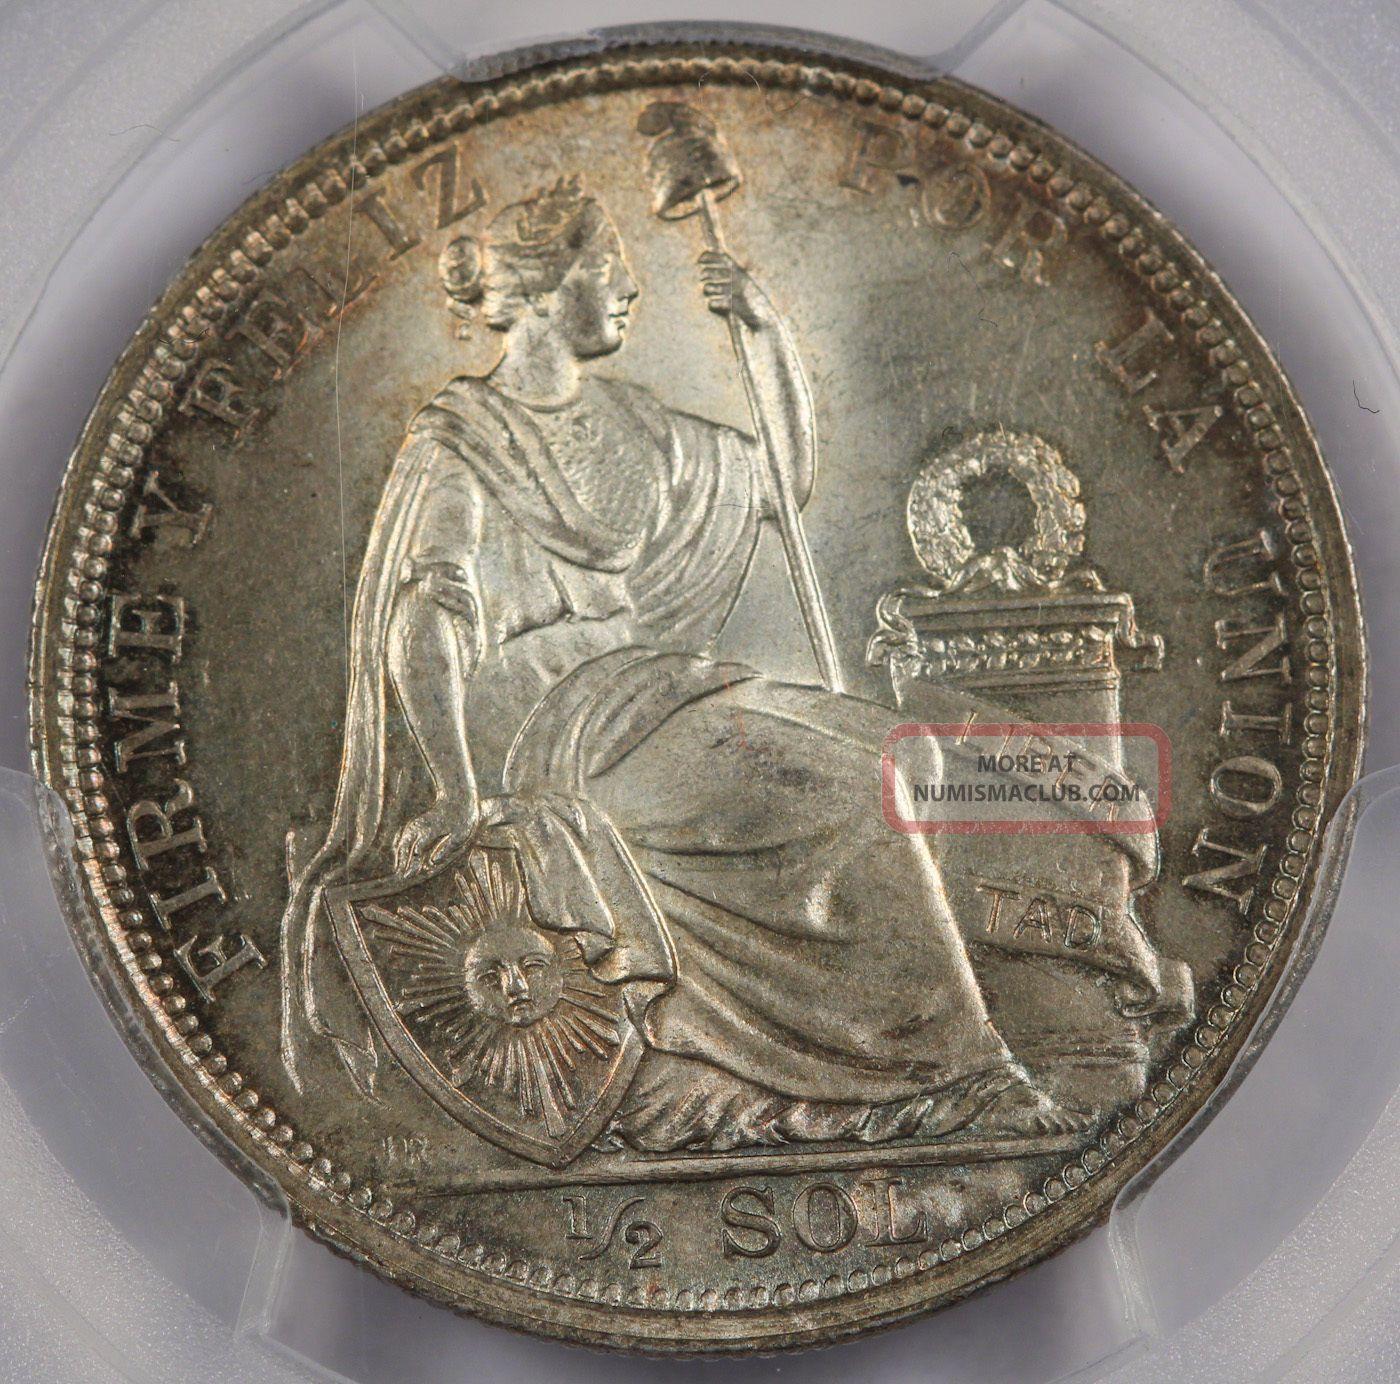 Peru 1915 Fg Jr 1/2 Sol Silver Coin Pcgs Ms66 Gem Bu Very Pretty Peru photo